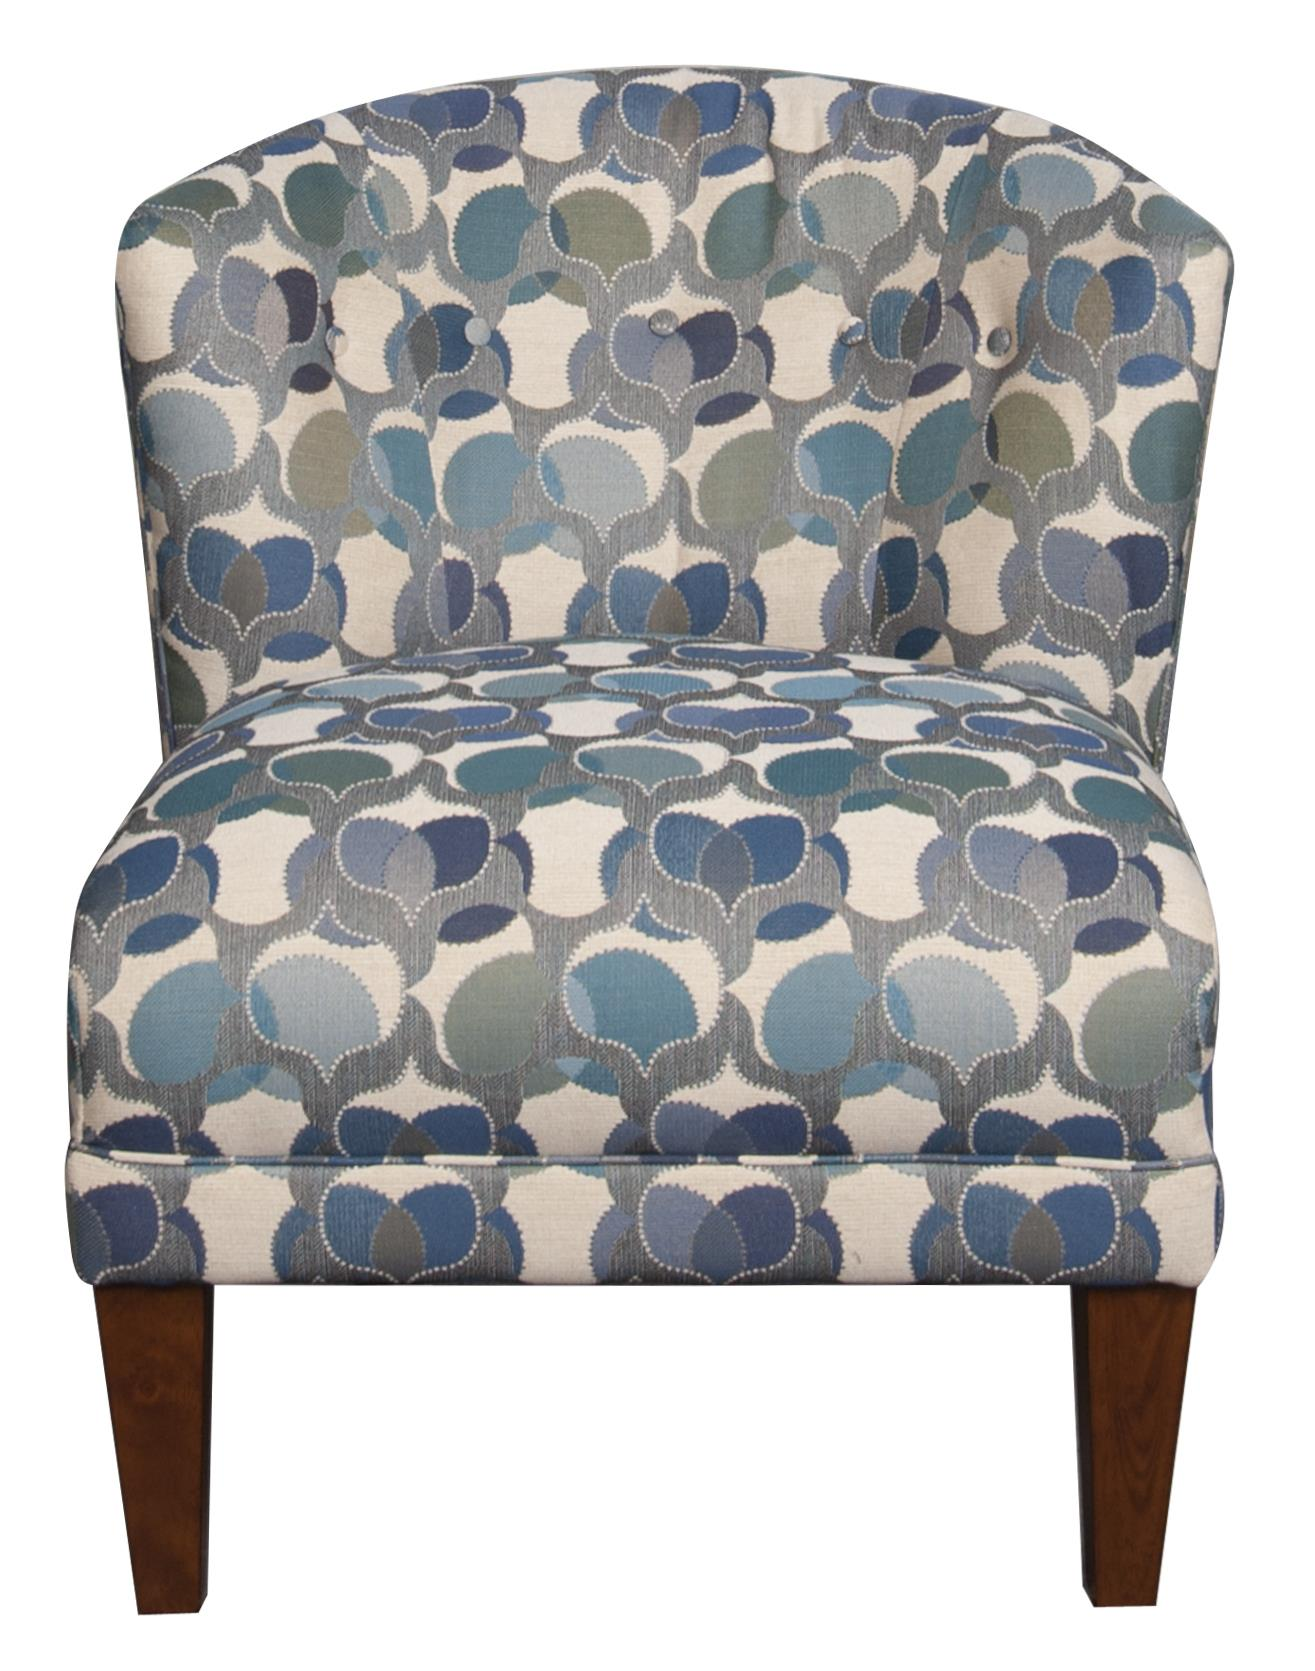 La-Z-Boy Laurel Nolita Accent Chair - Item Number: 729569885